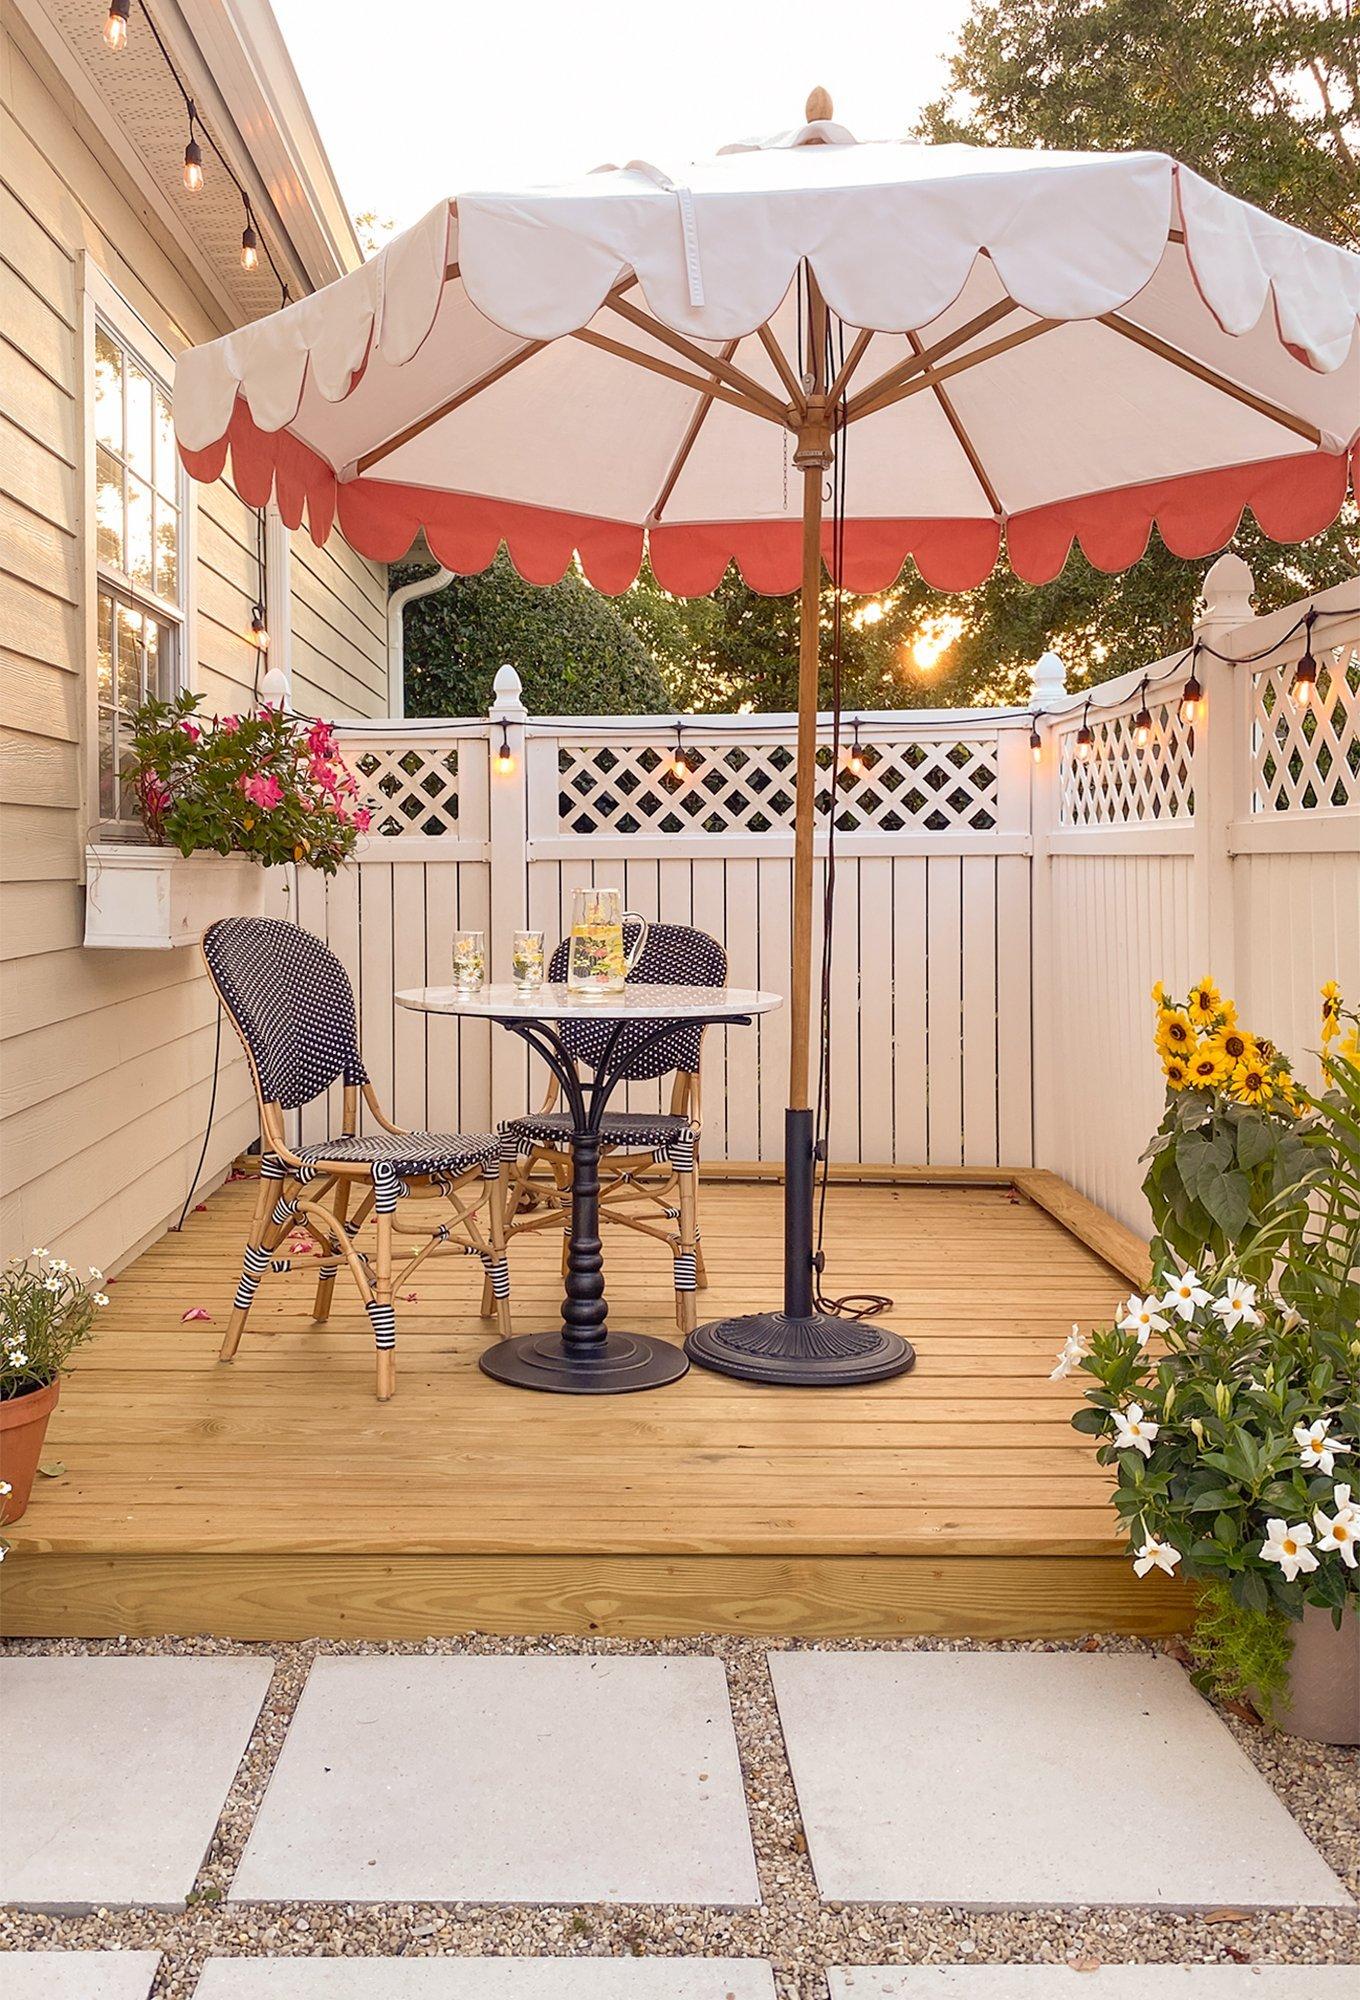 How to Build a Backyard Deck – DIY